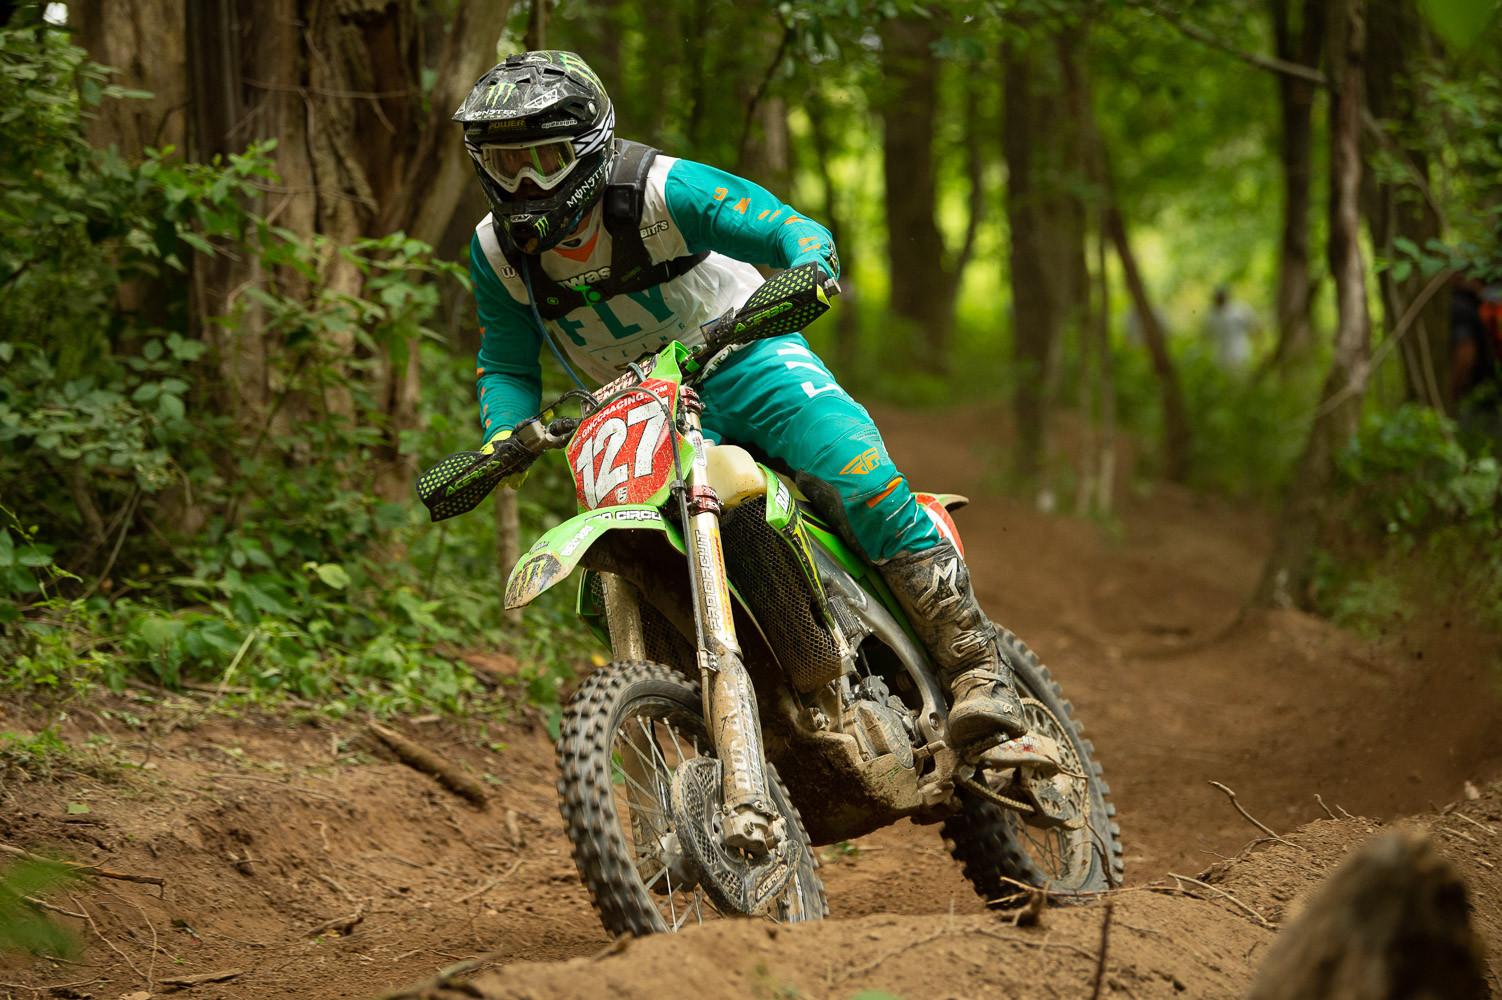 GNCC racer Jordan Ashburn (127) in action. Photo courtesy Dunlop.